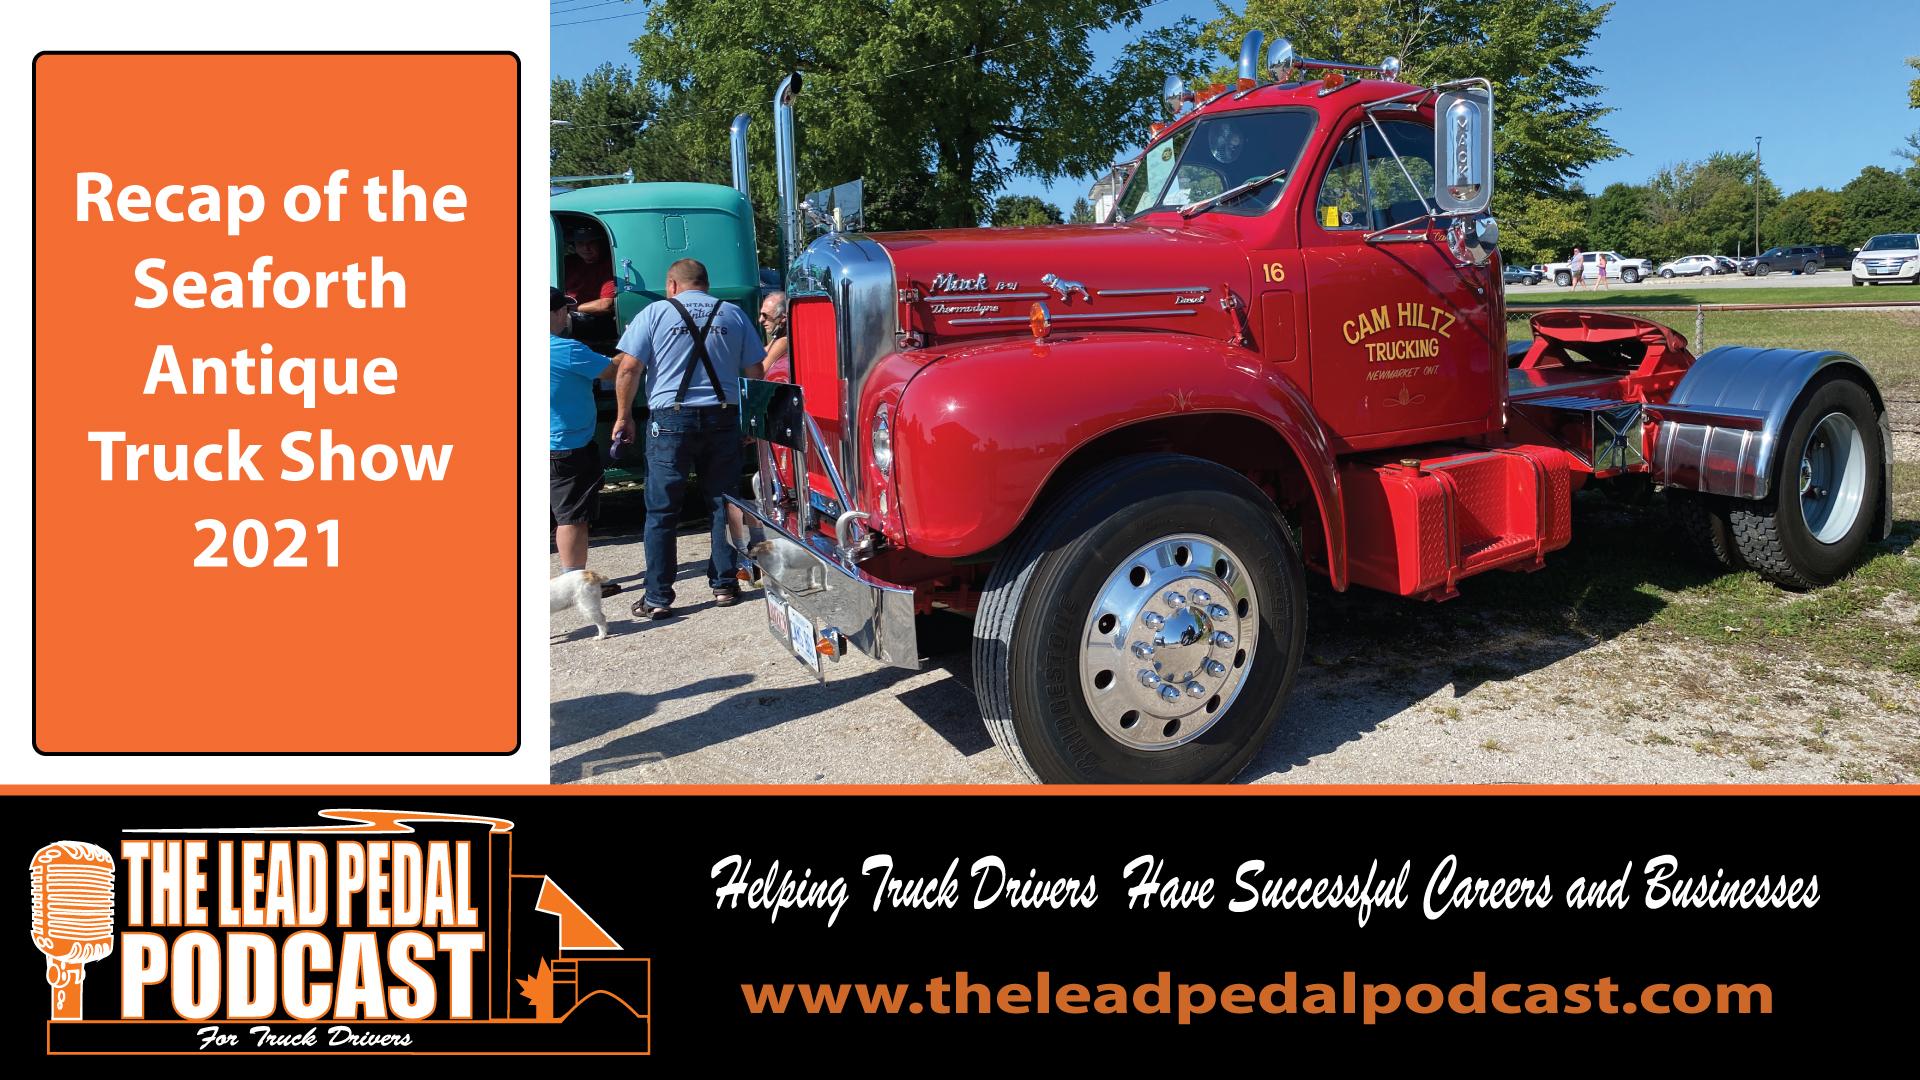 LP701 Recap of the Seaforth Truck Show 2021